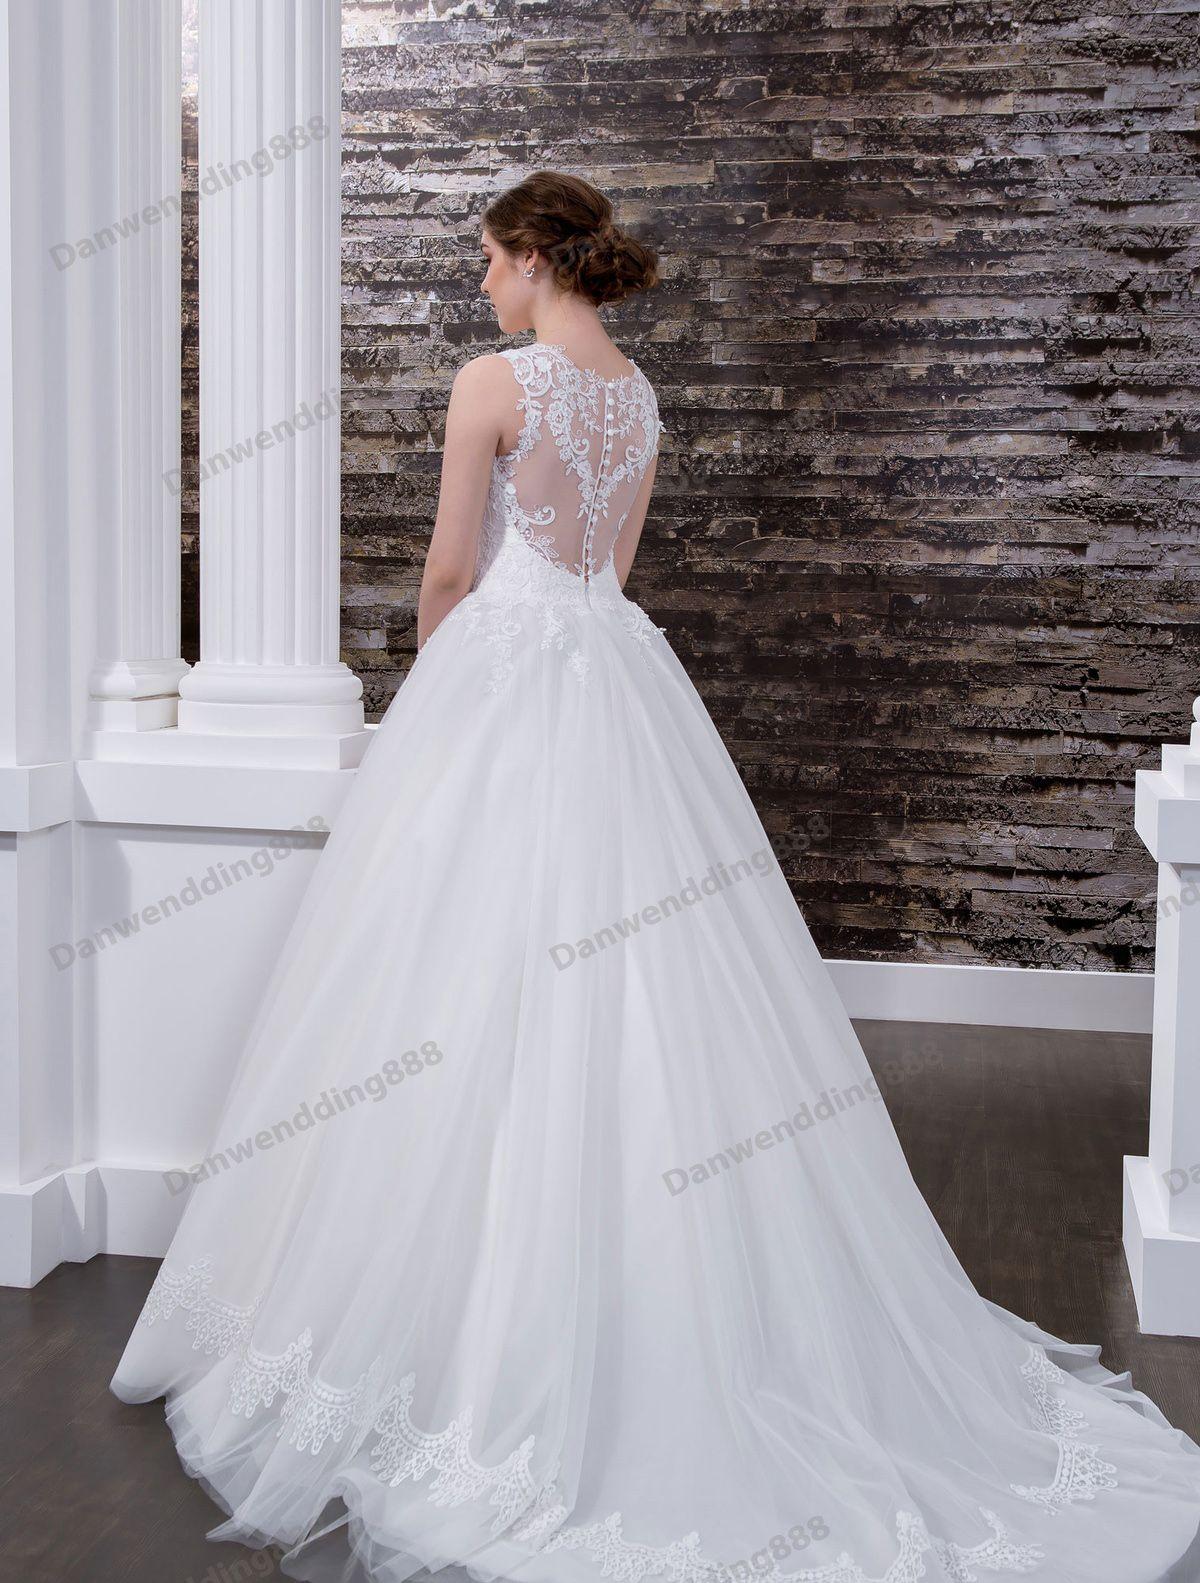 Beauty White Tulle Straps Applique A-Line Wedding Dresses Bridal Pageant Dresses Wedding Attire Dresses Custom Size 2-16 ZW608074